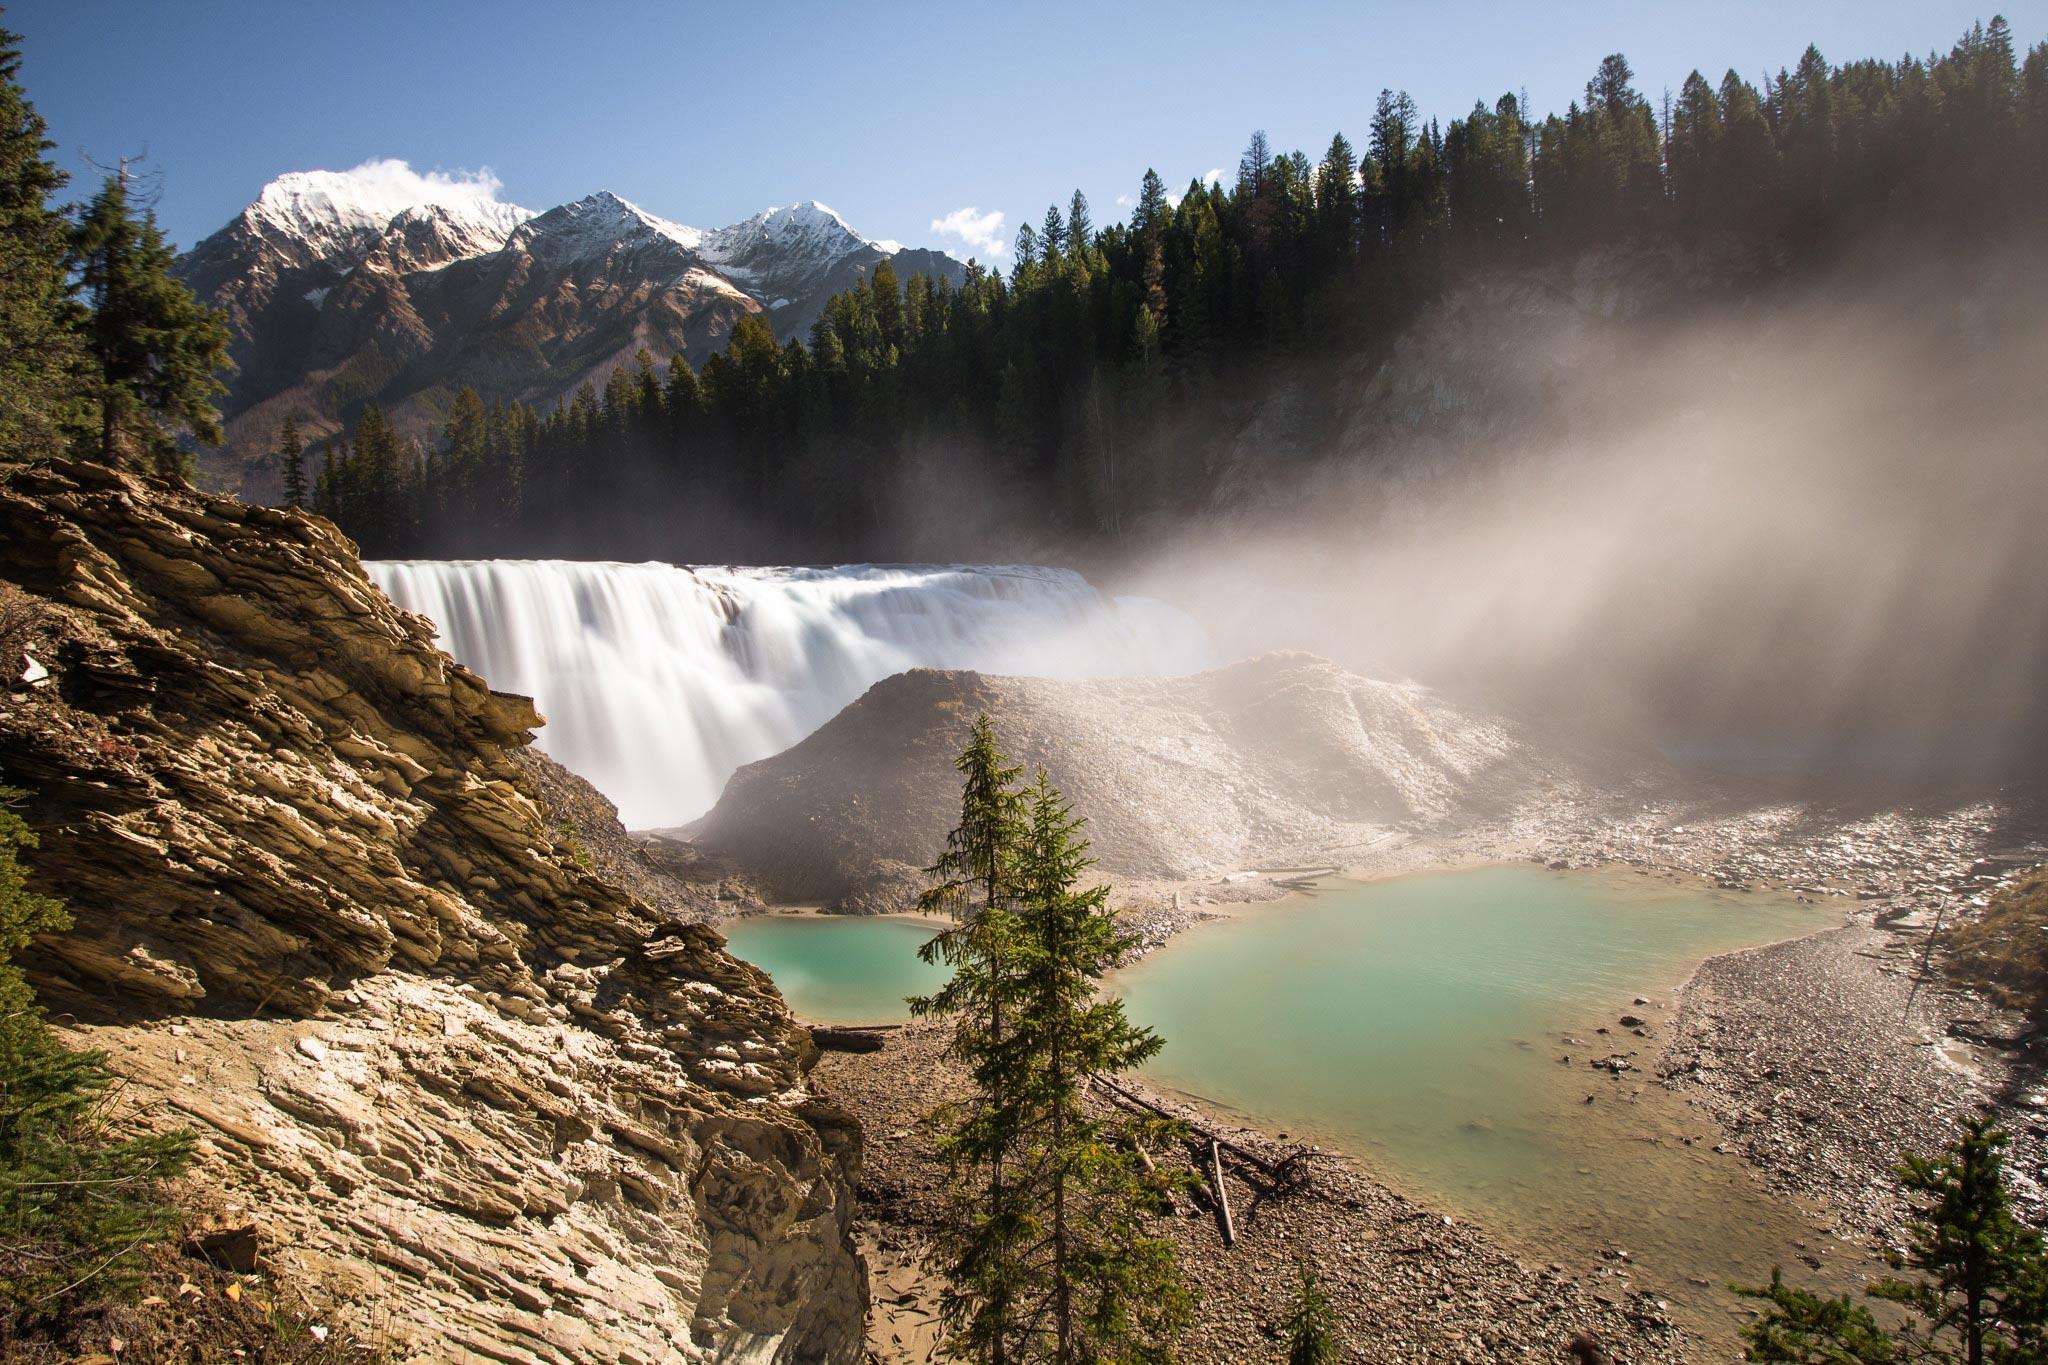 Hike to Wapta Falls, the 'Niagara Falls' of Yoho National Park -